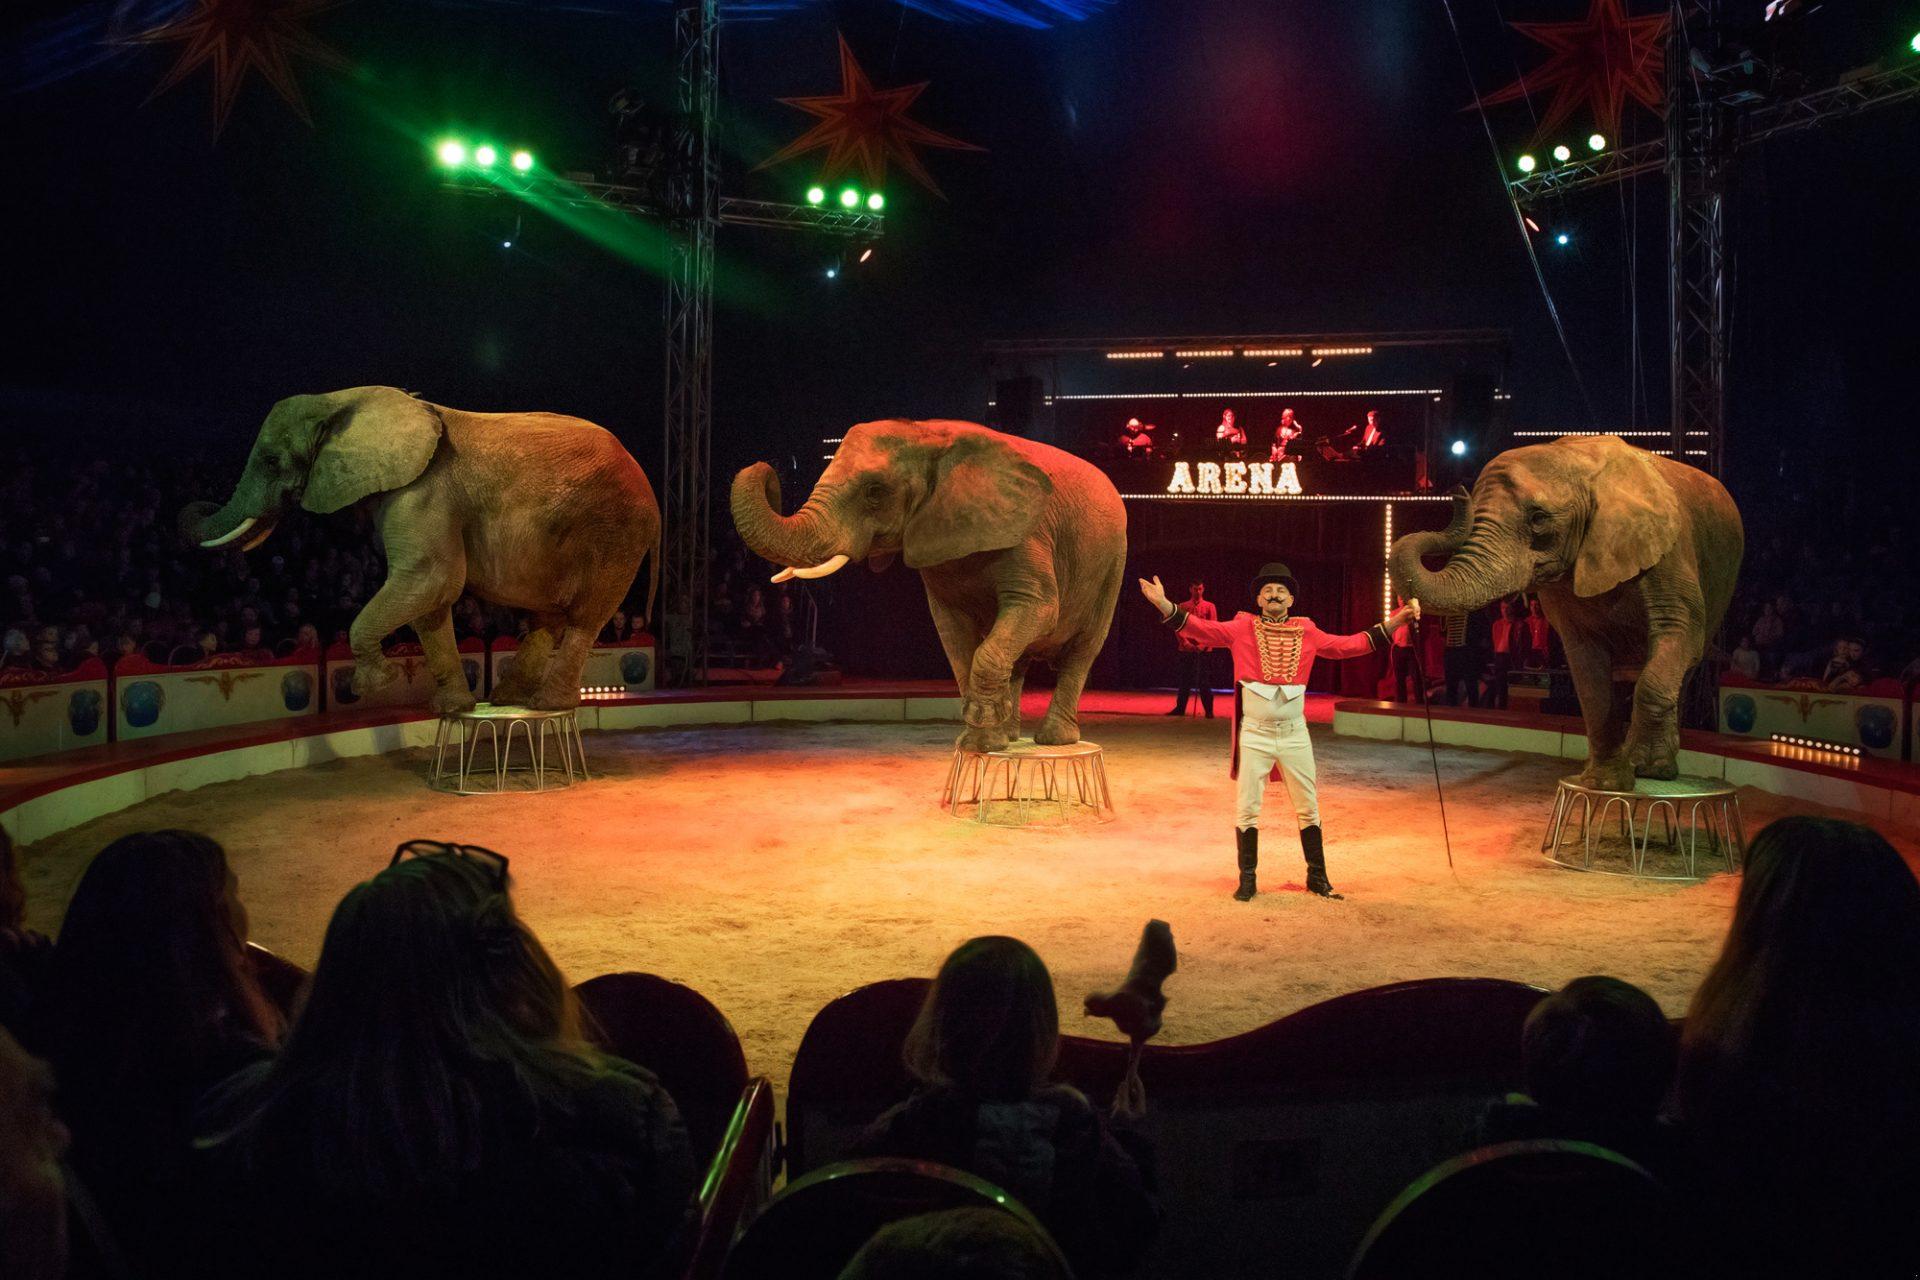 Cirkus Arena: Bubber laver sin egen cirkusforestilling i Aarhus